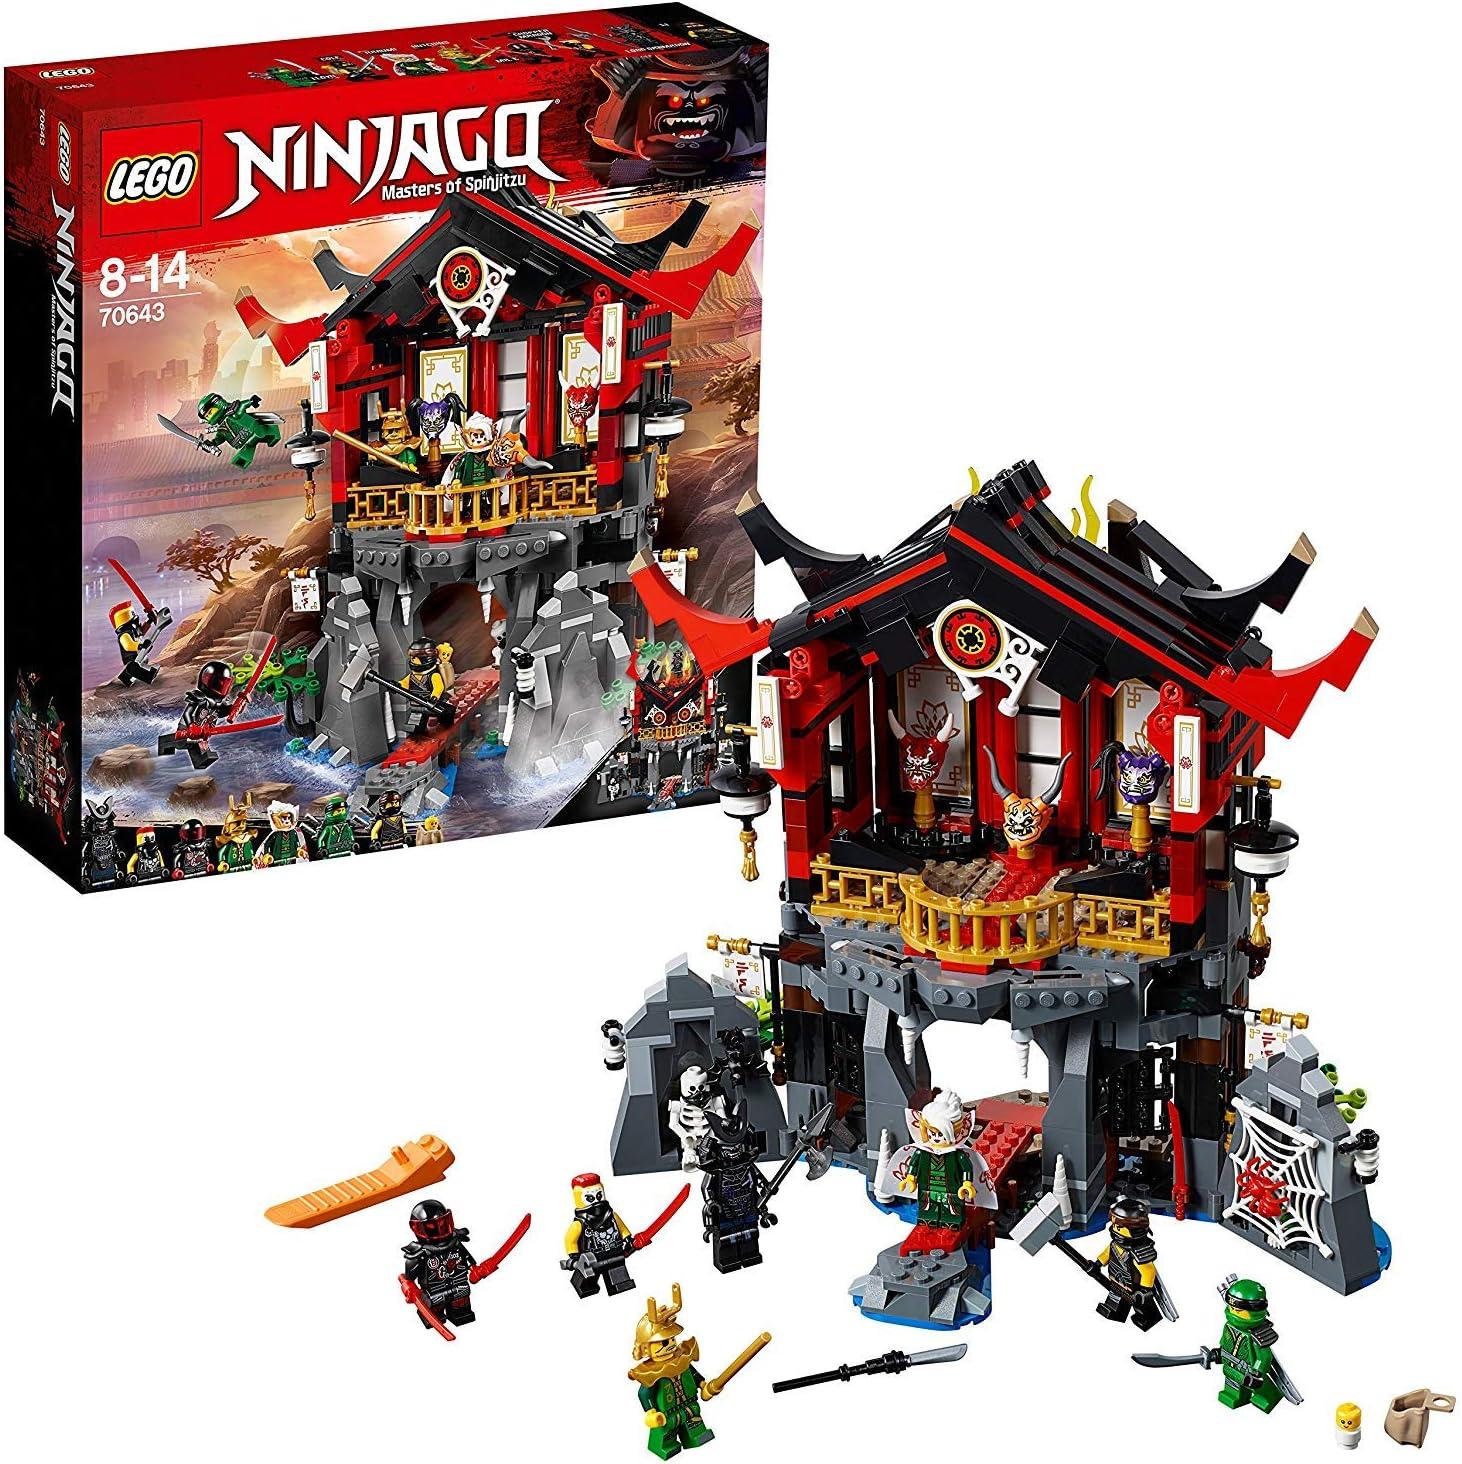 New Ninjago LEGO® Cole Sons of Garmadon Black Ninja Minifigure 70643 Genuine